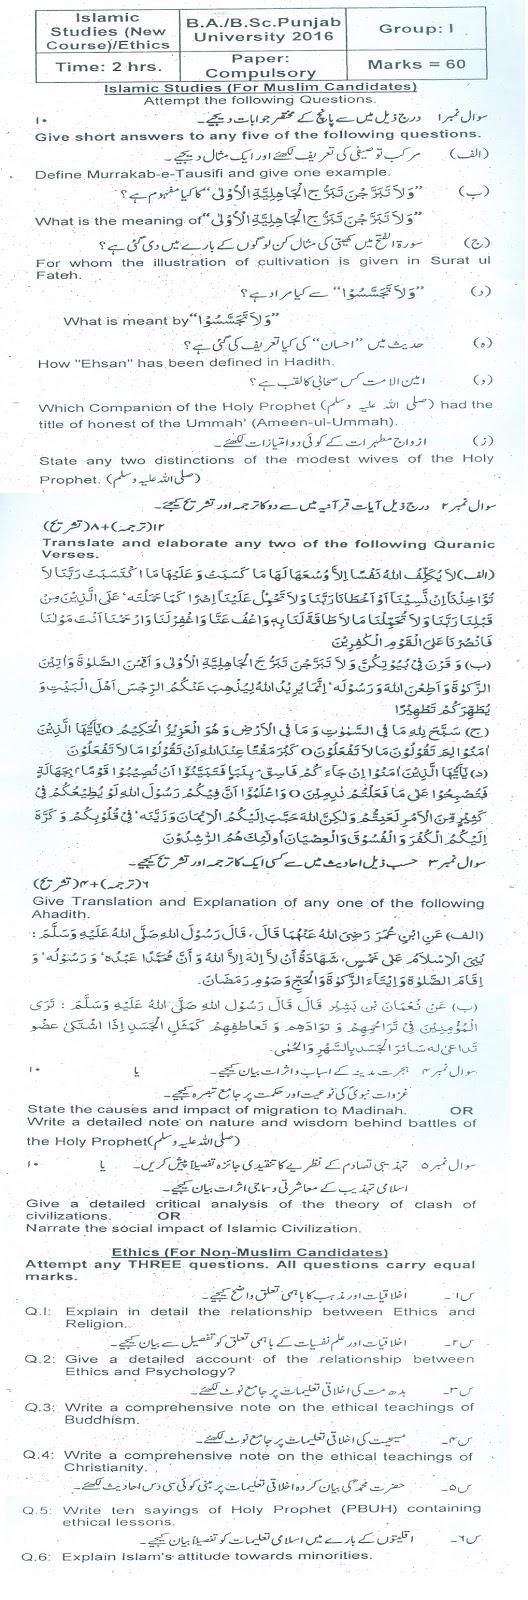 ba islamyat punjab university paper